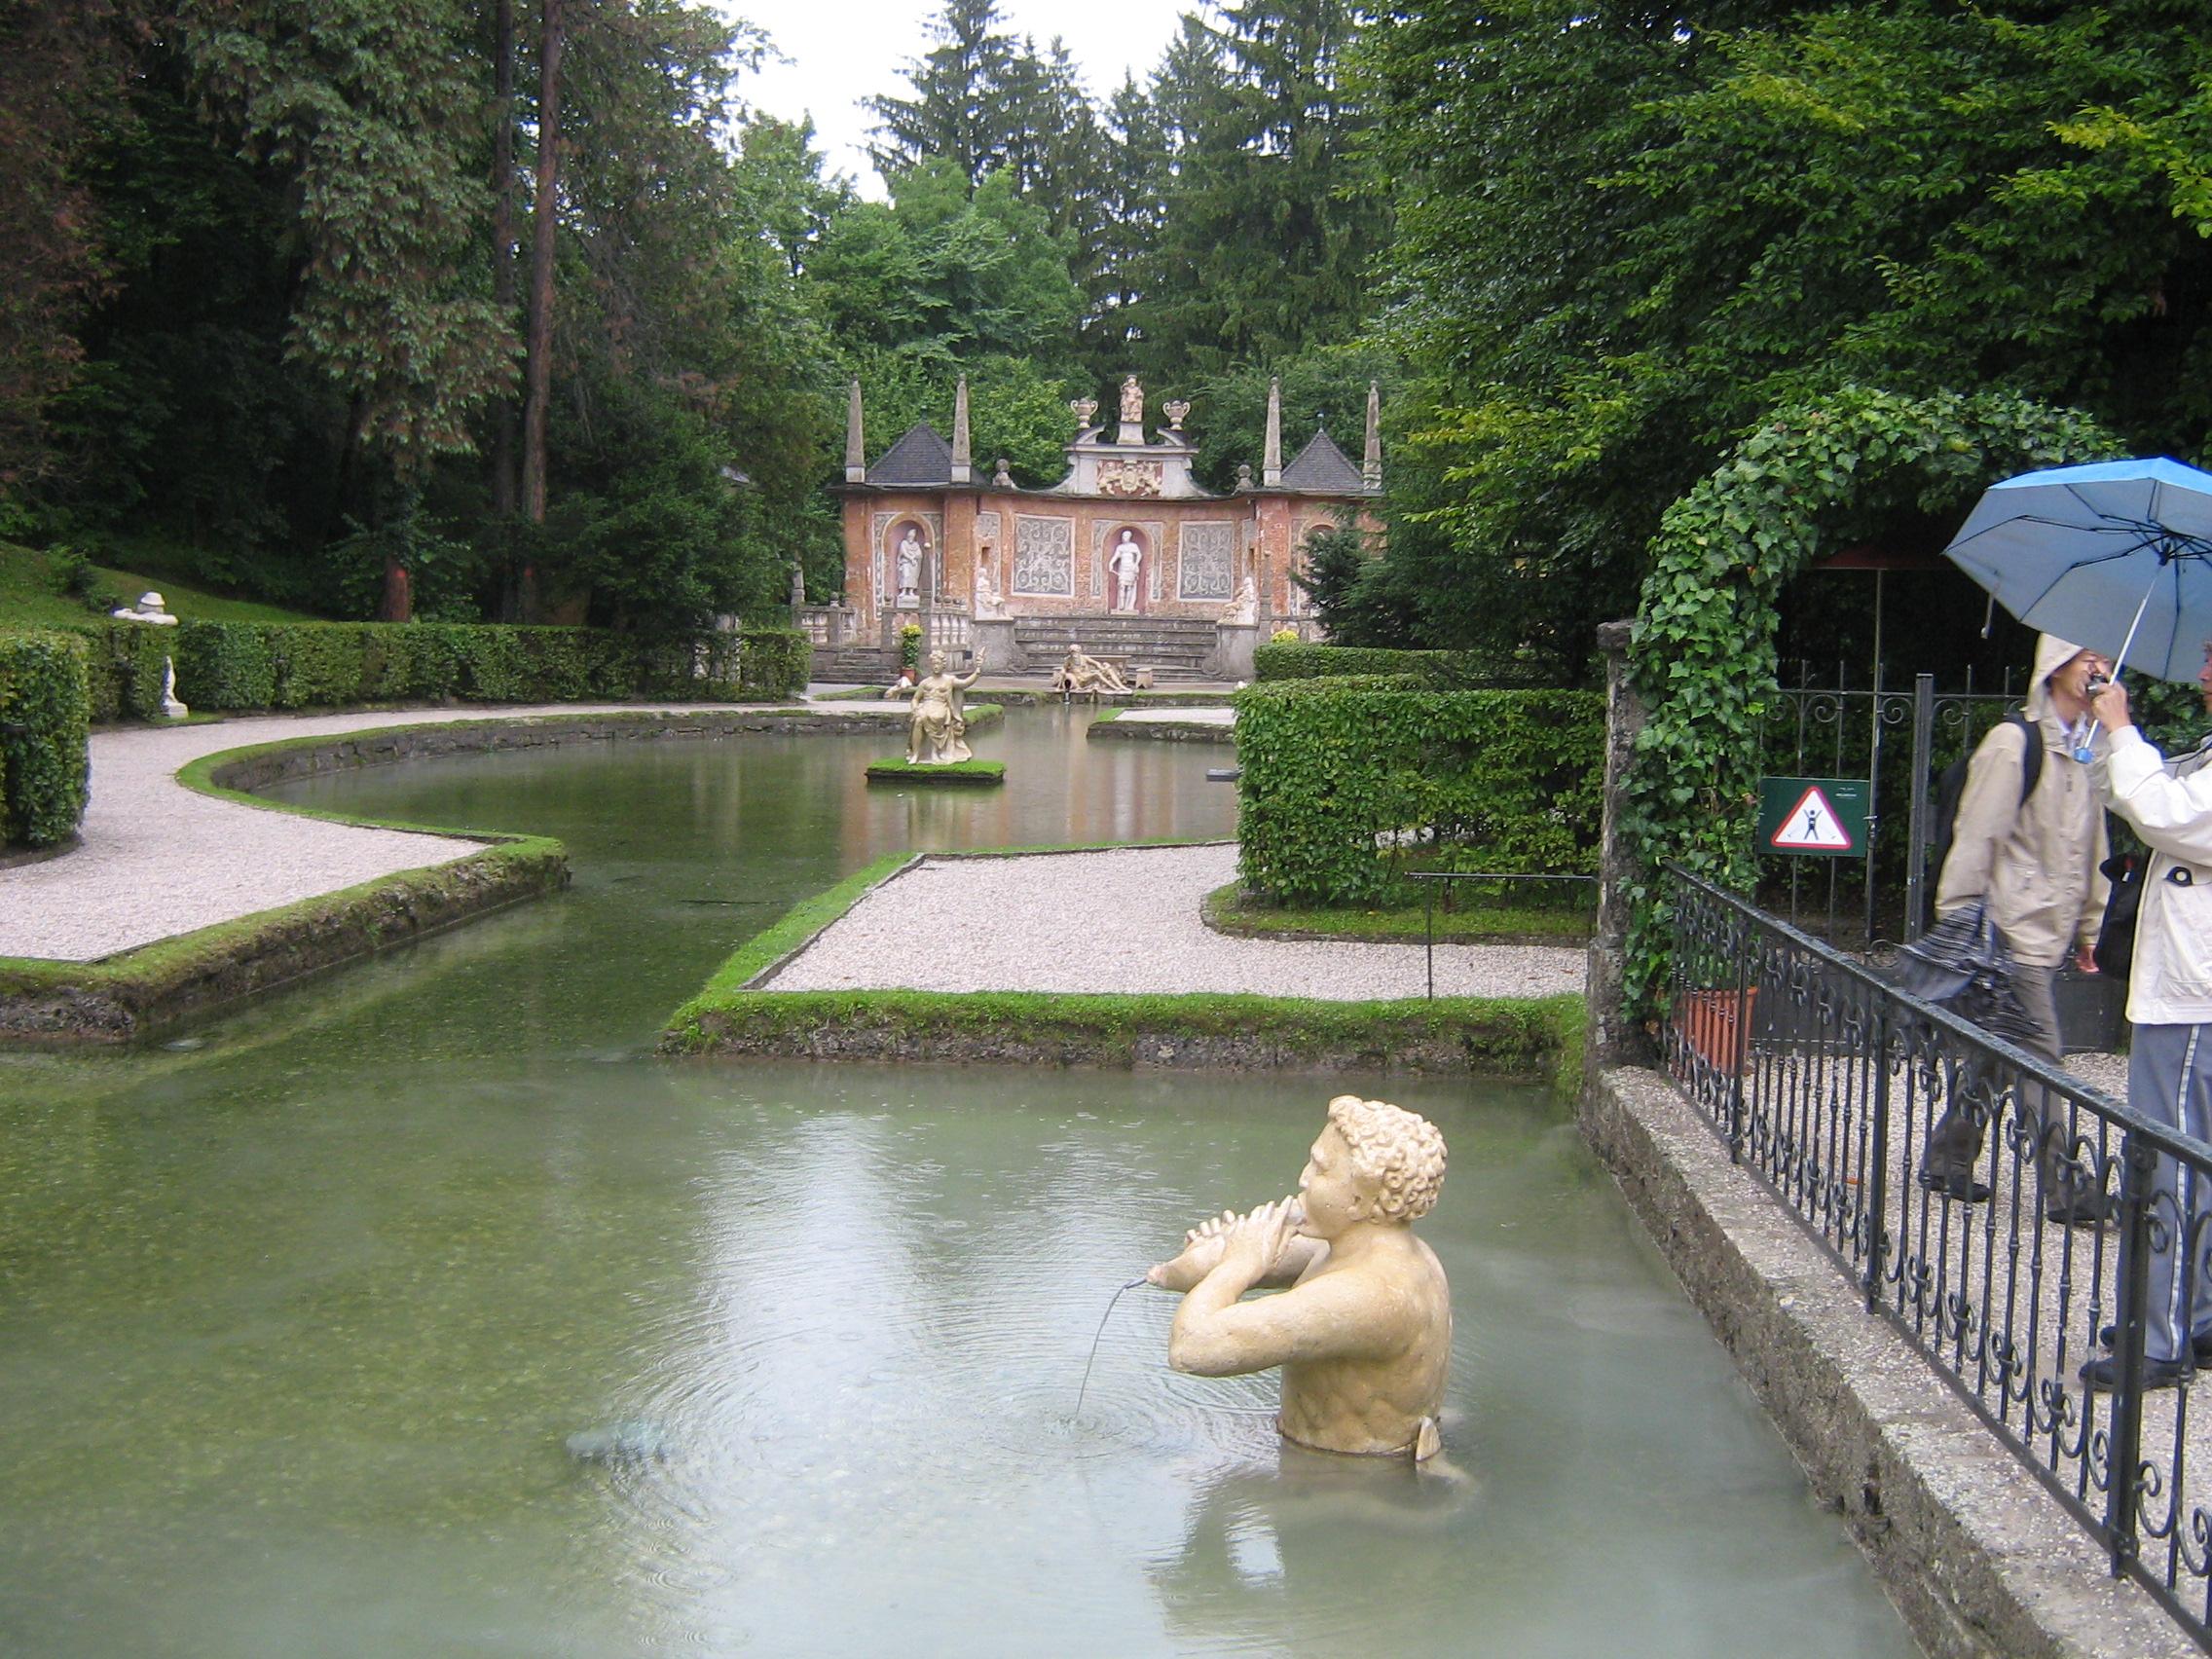 File:Ornamental pool in Hellbrunn Palace, Salzburg ...